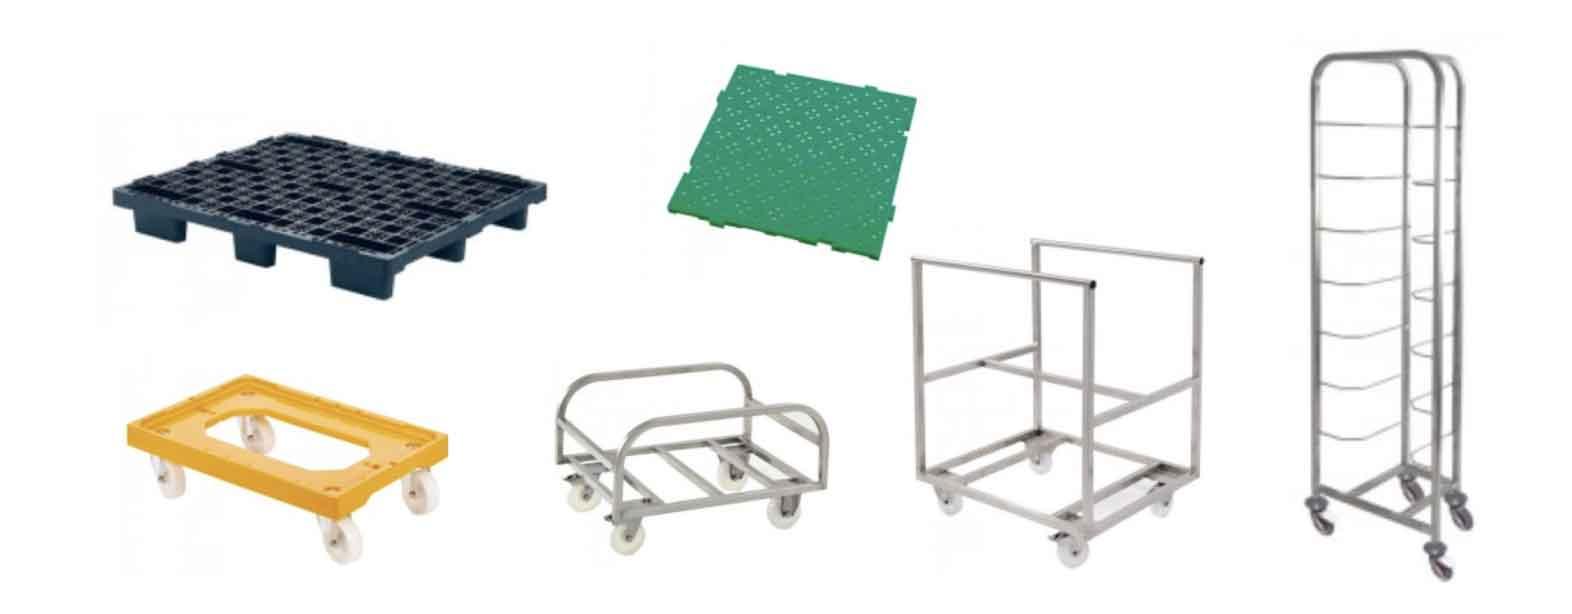 Manutention et stockage